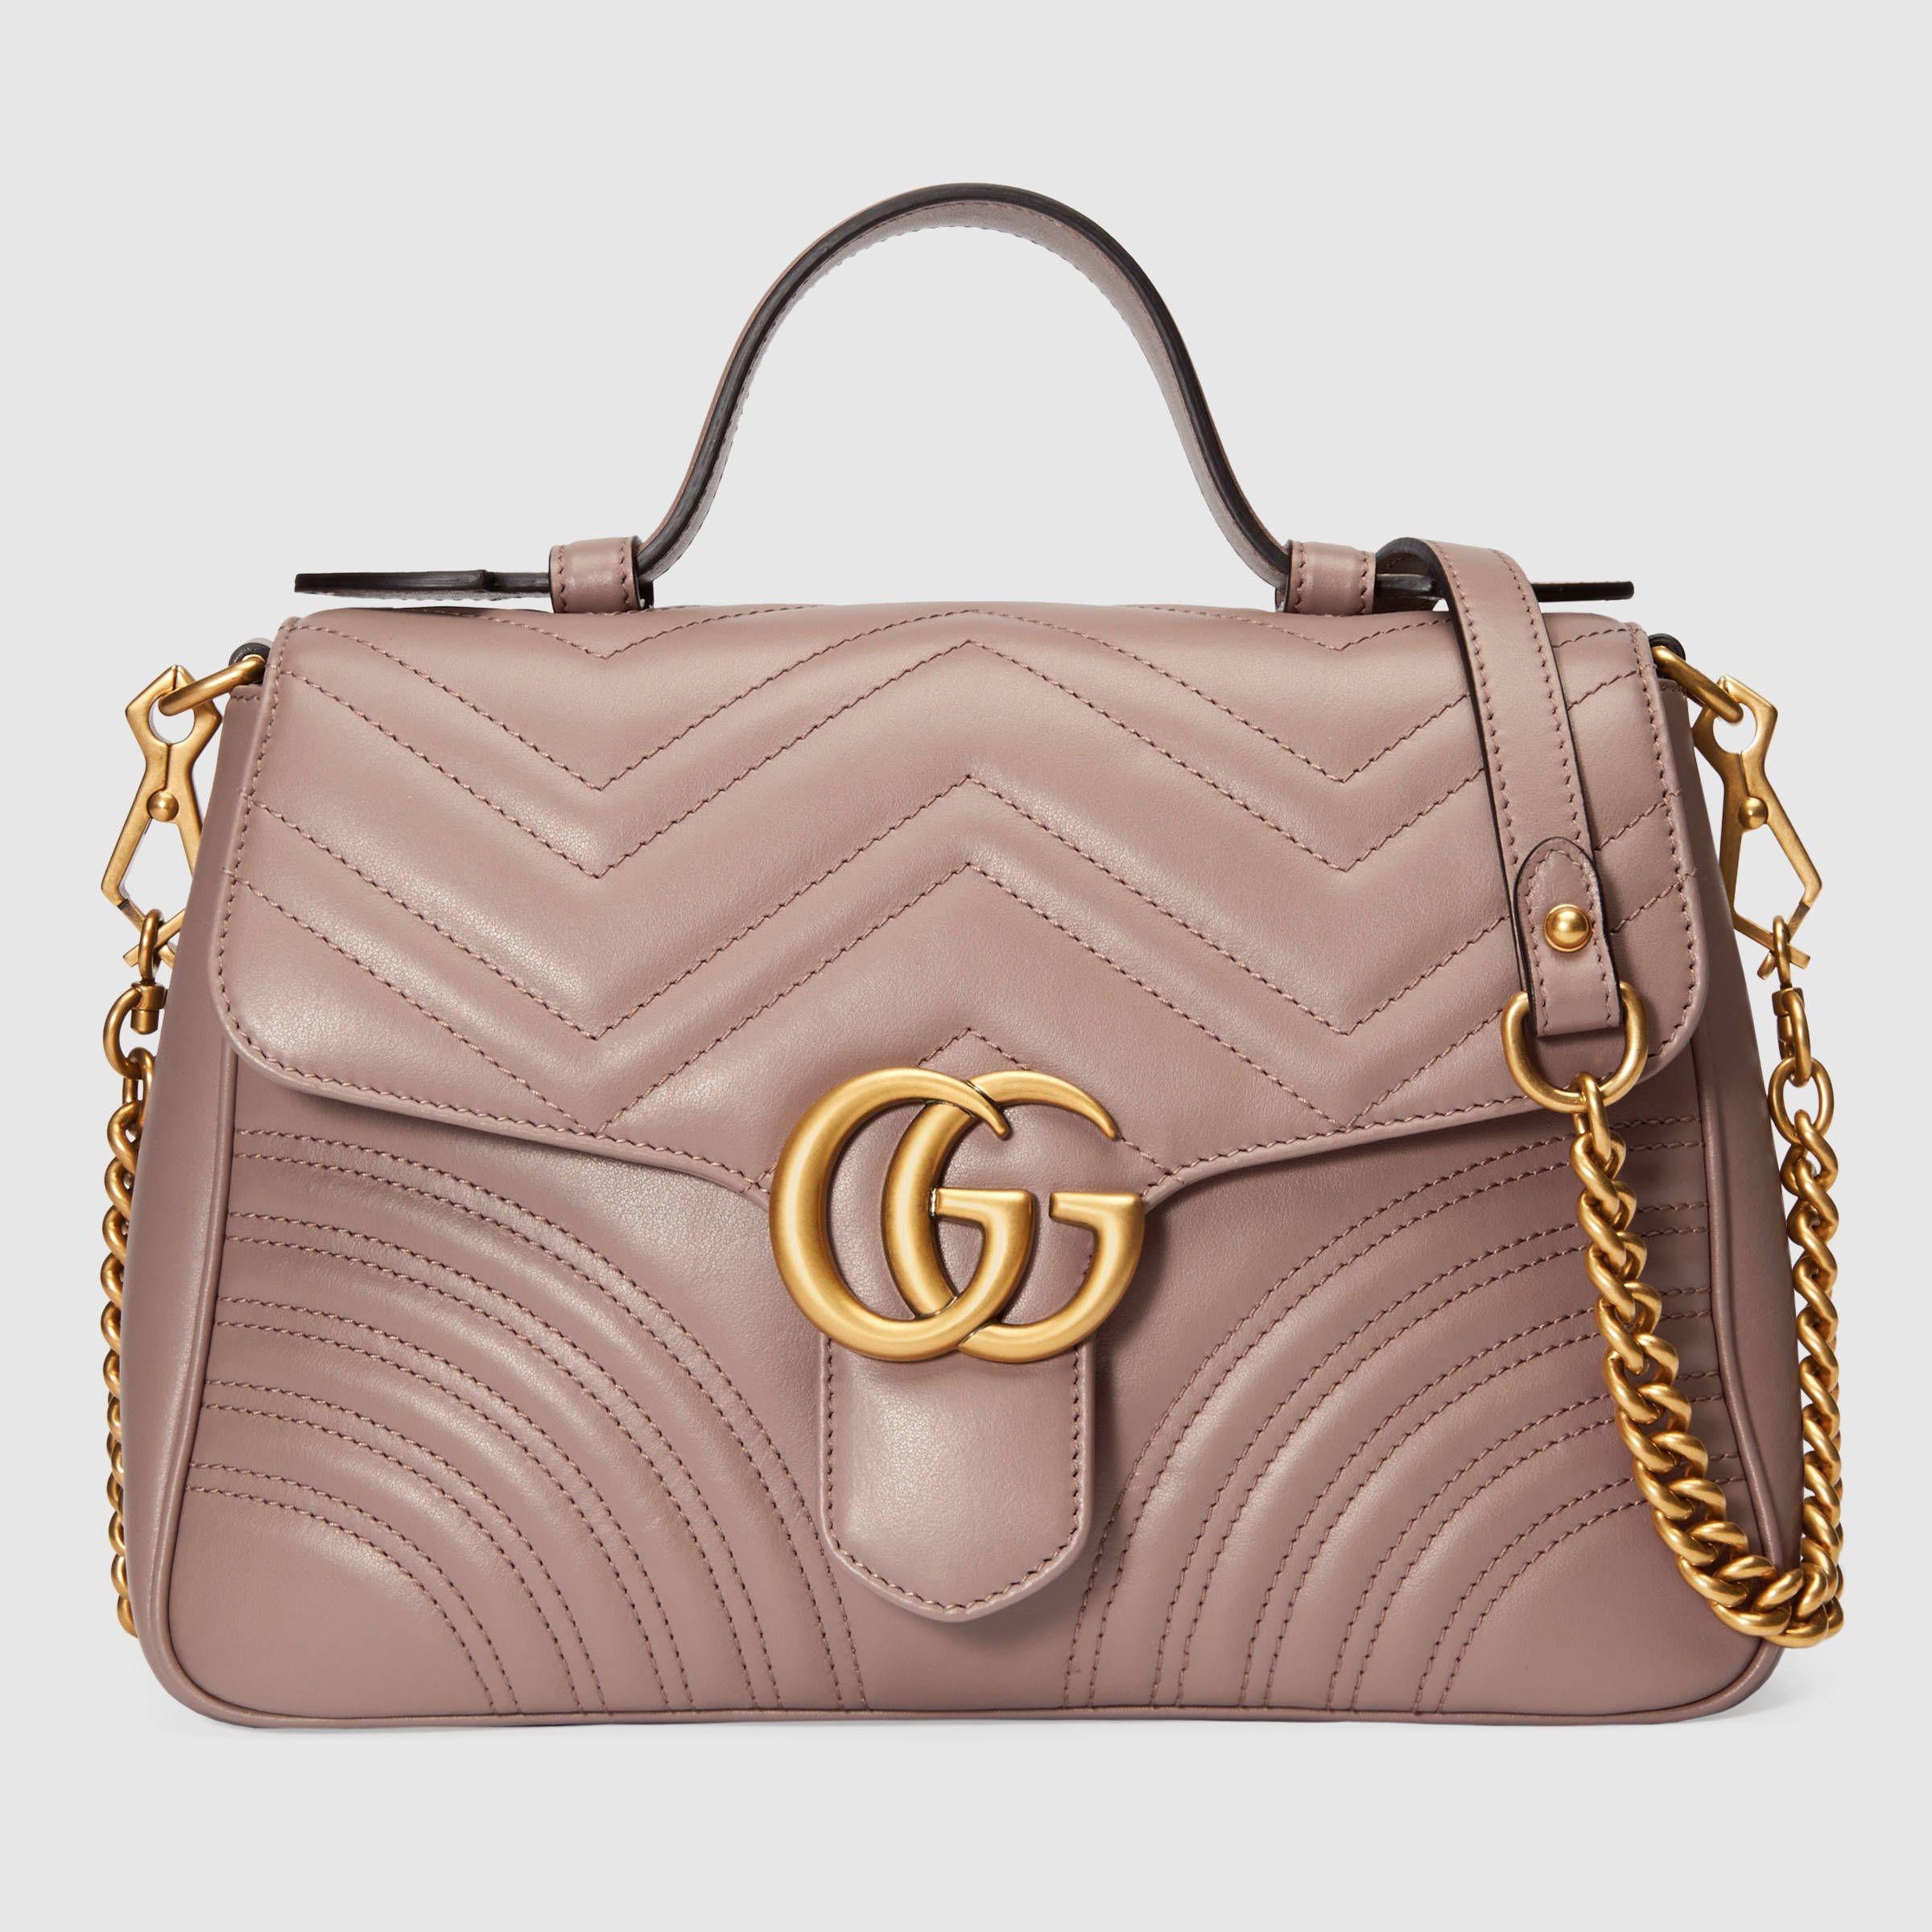 50f8584c9d66 GG Marmont small top handle bag in 2019 | Handbags | Gucci handbags ...